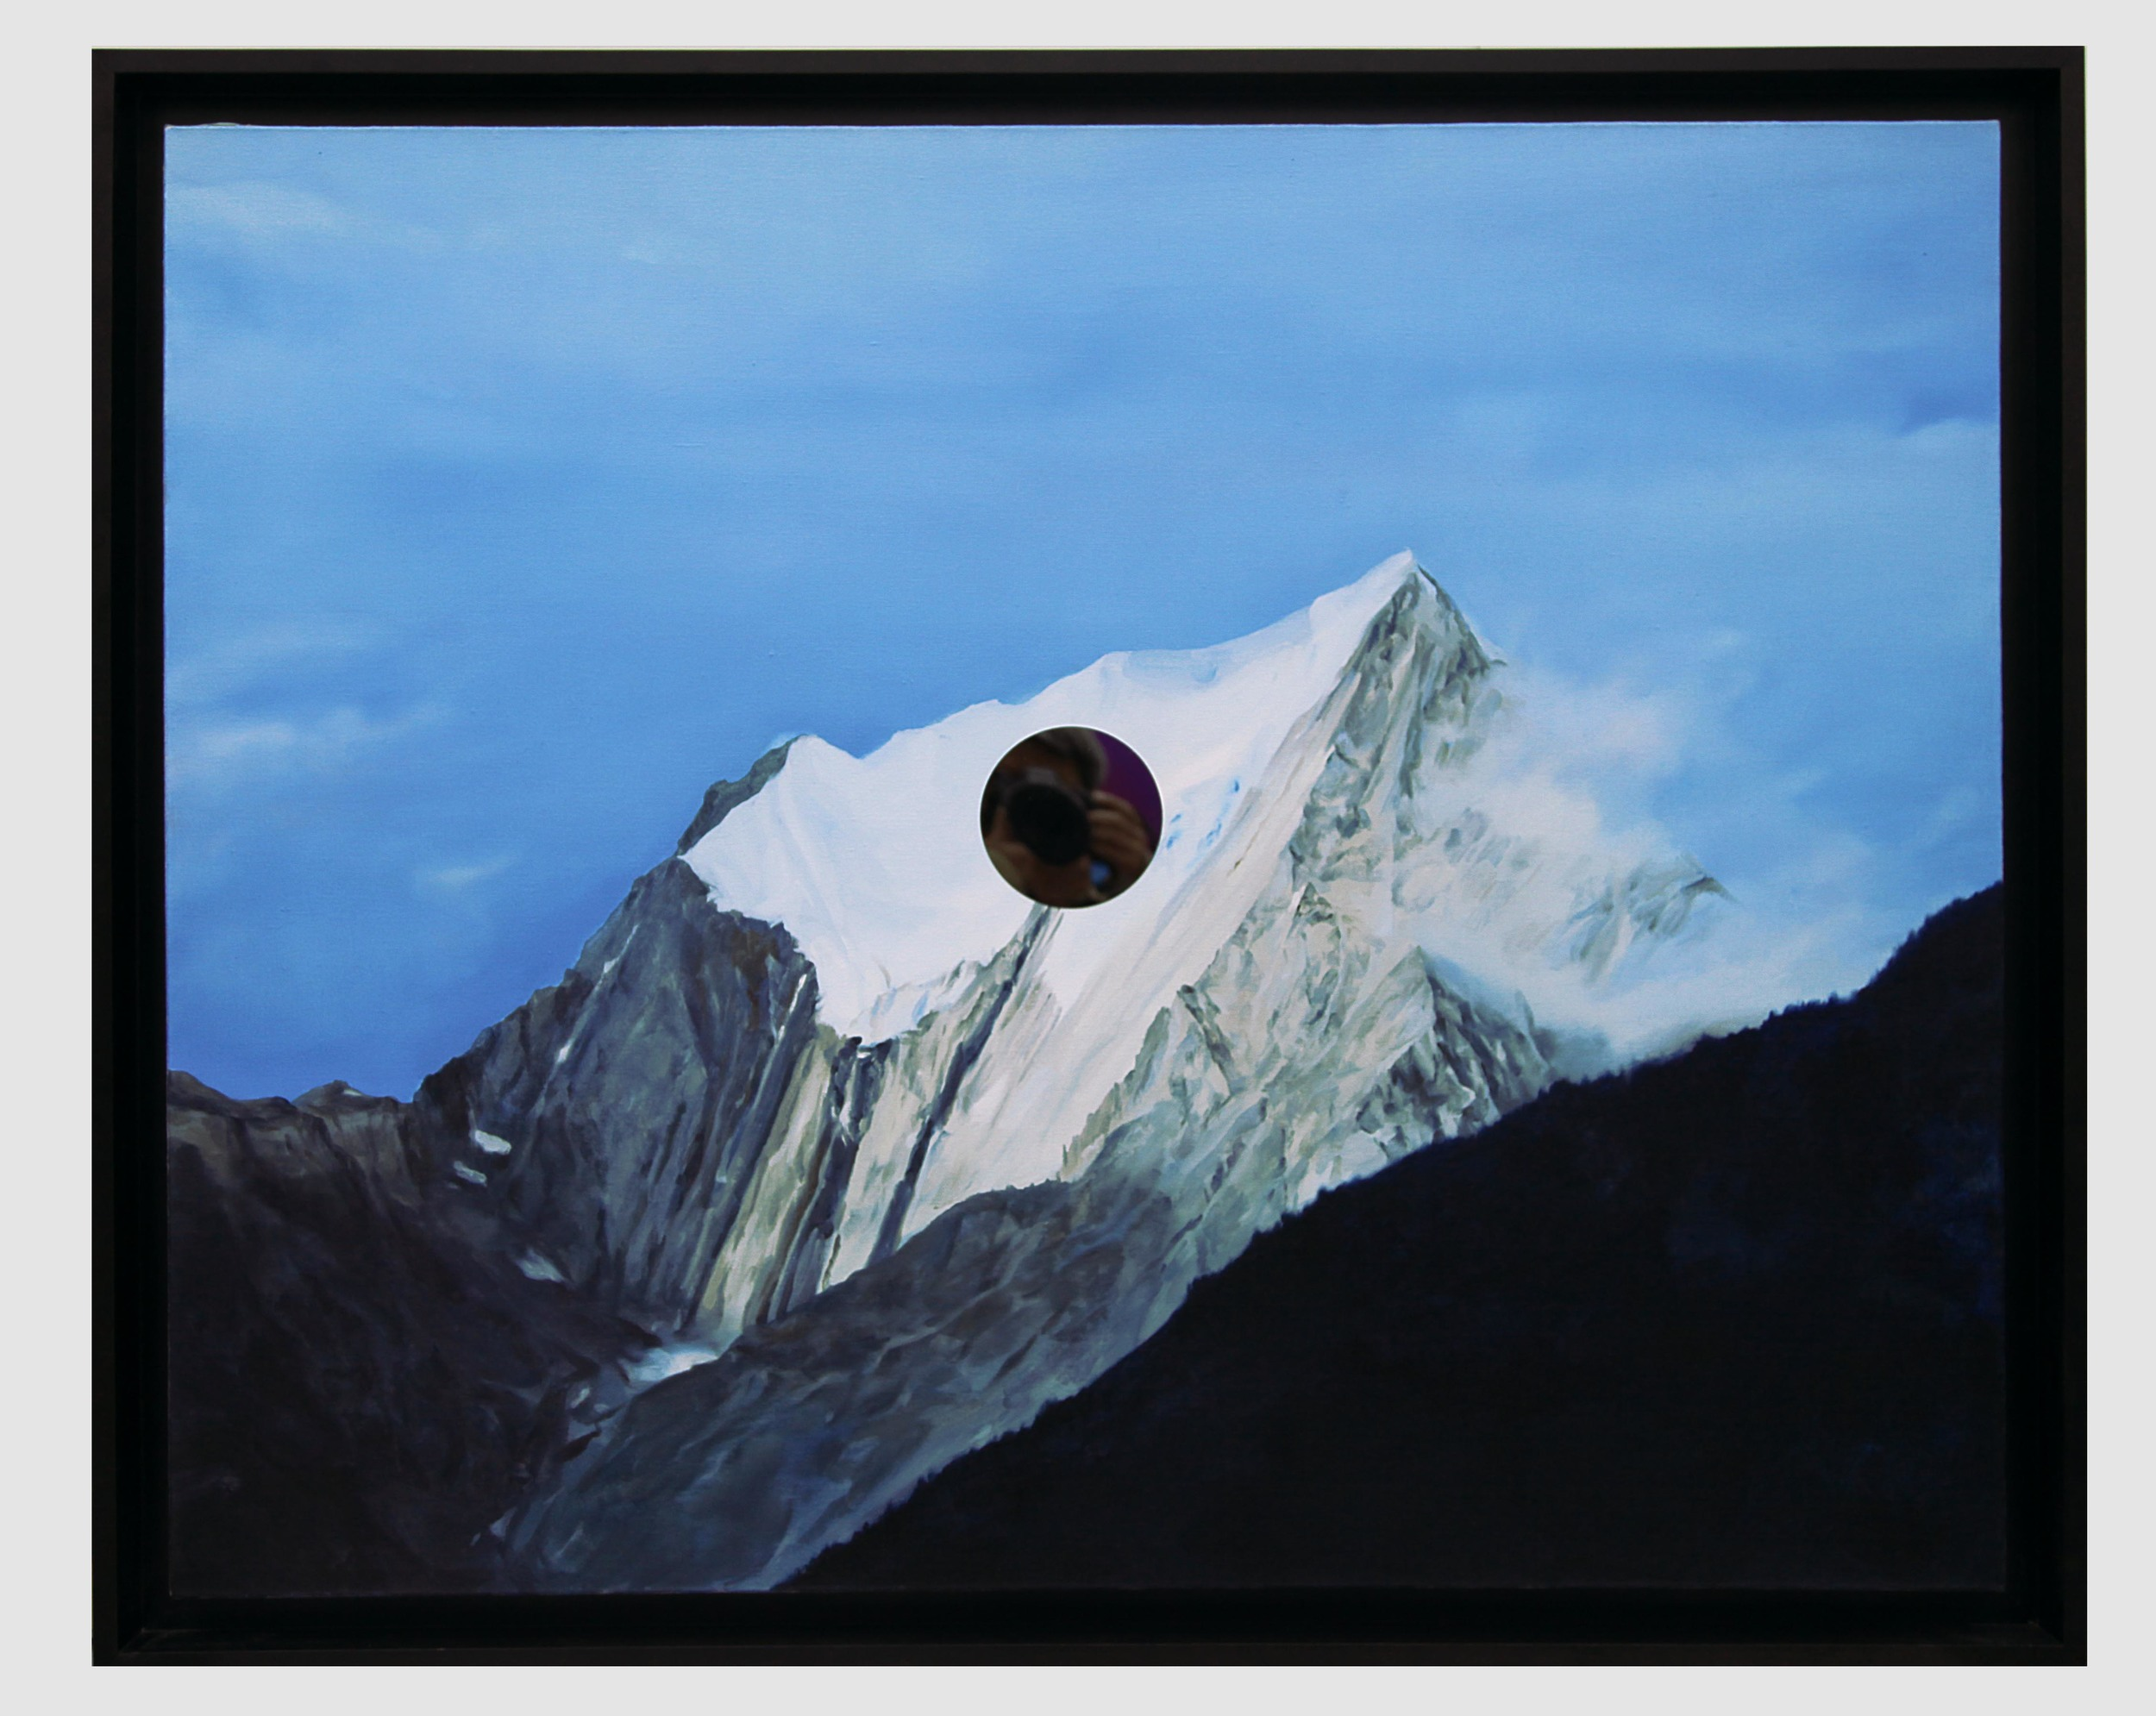 Gao Weigang 高伟刚, Echo 5 回声之五, 2012, Oil on canvas and mirror polished steel 布面油画、不锈钢镜, 120 x 150 cm